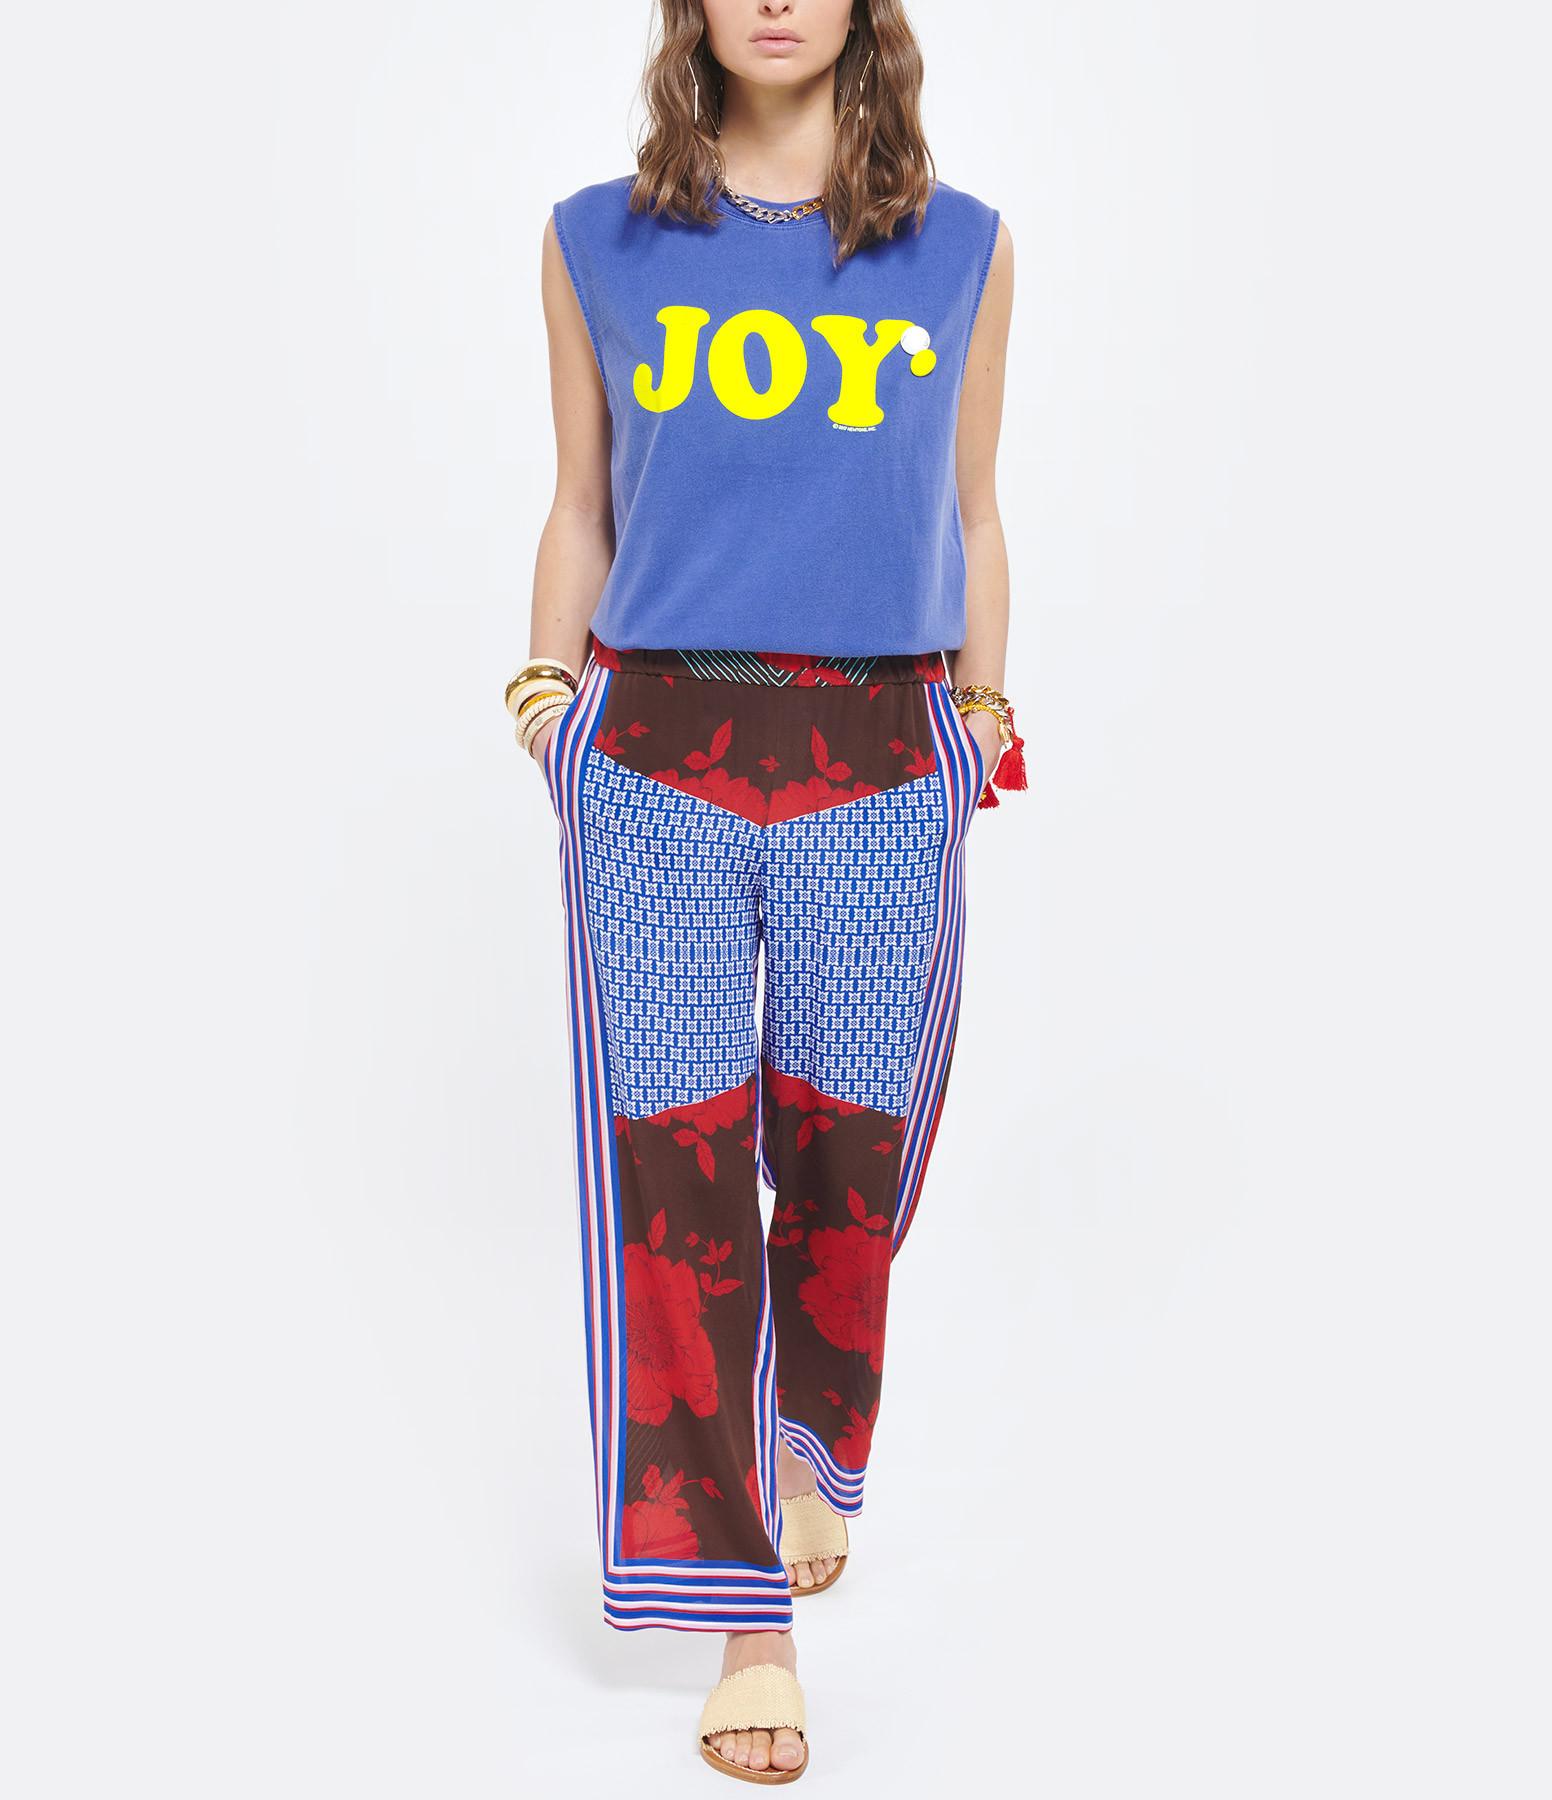 NEWTONE - Tee-shirt Biker Joy Coton Flo Bleu